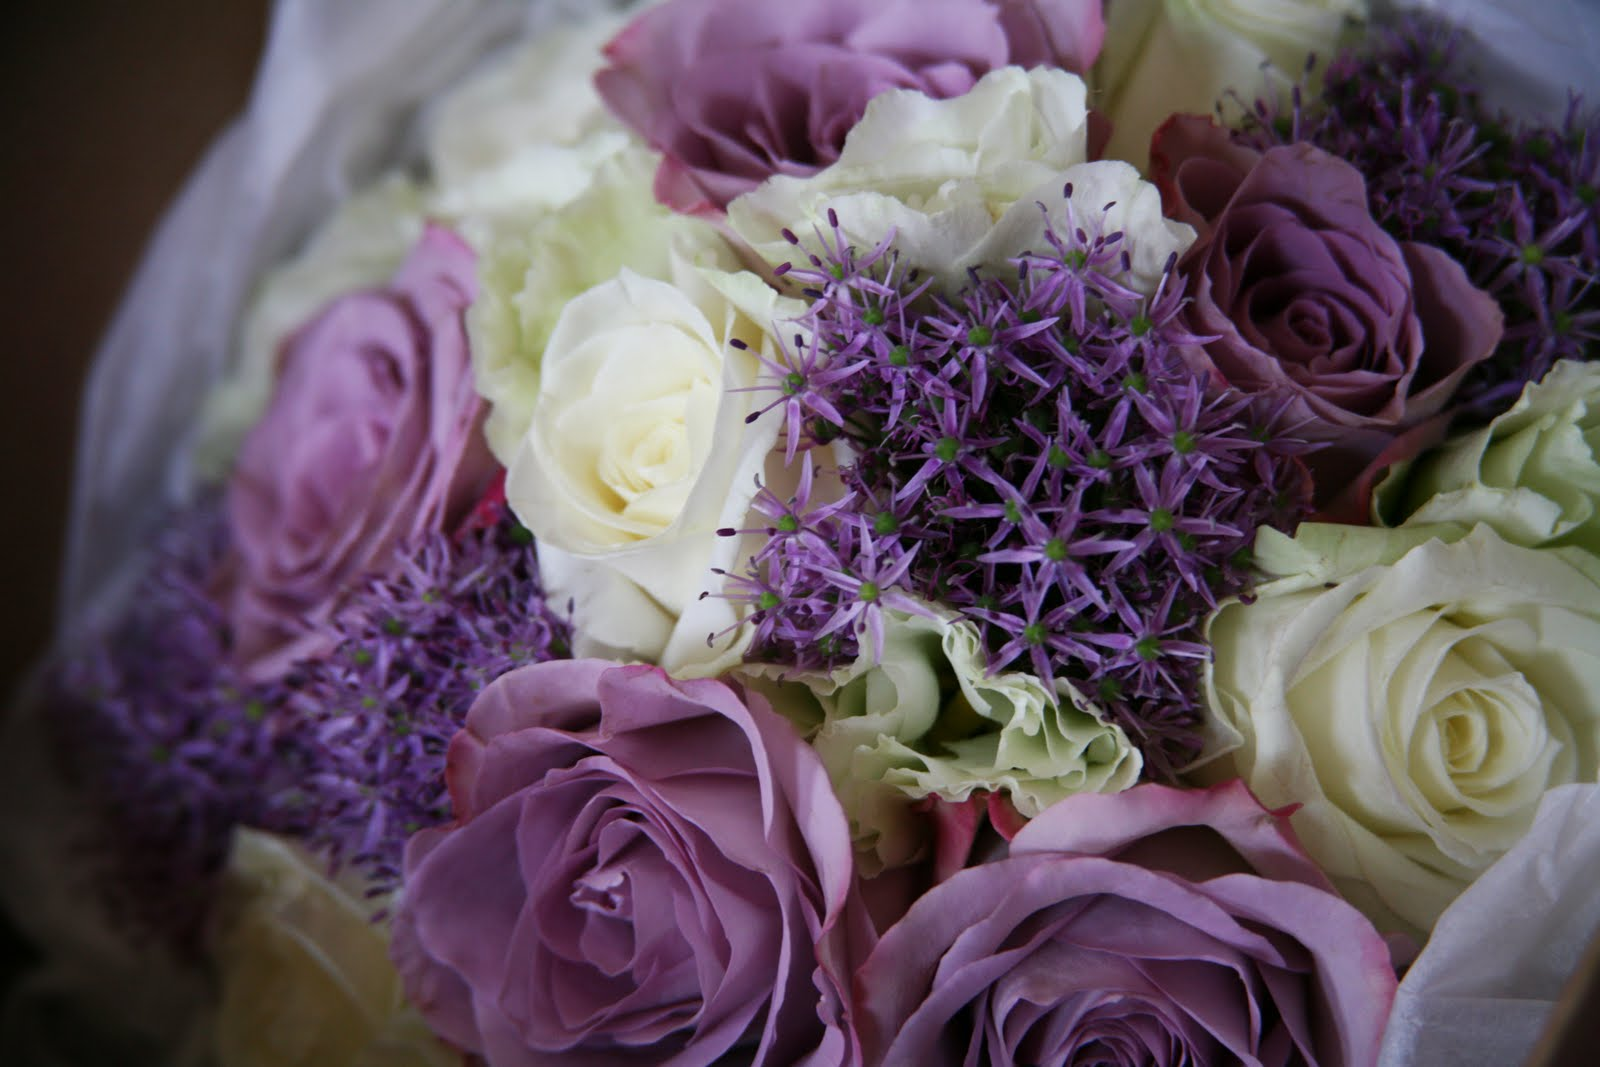 Wedding Flowers Blog: Laura's Contemporary Wedding Flowers ...